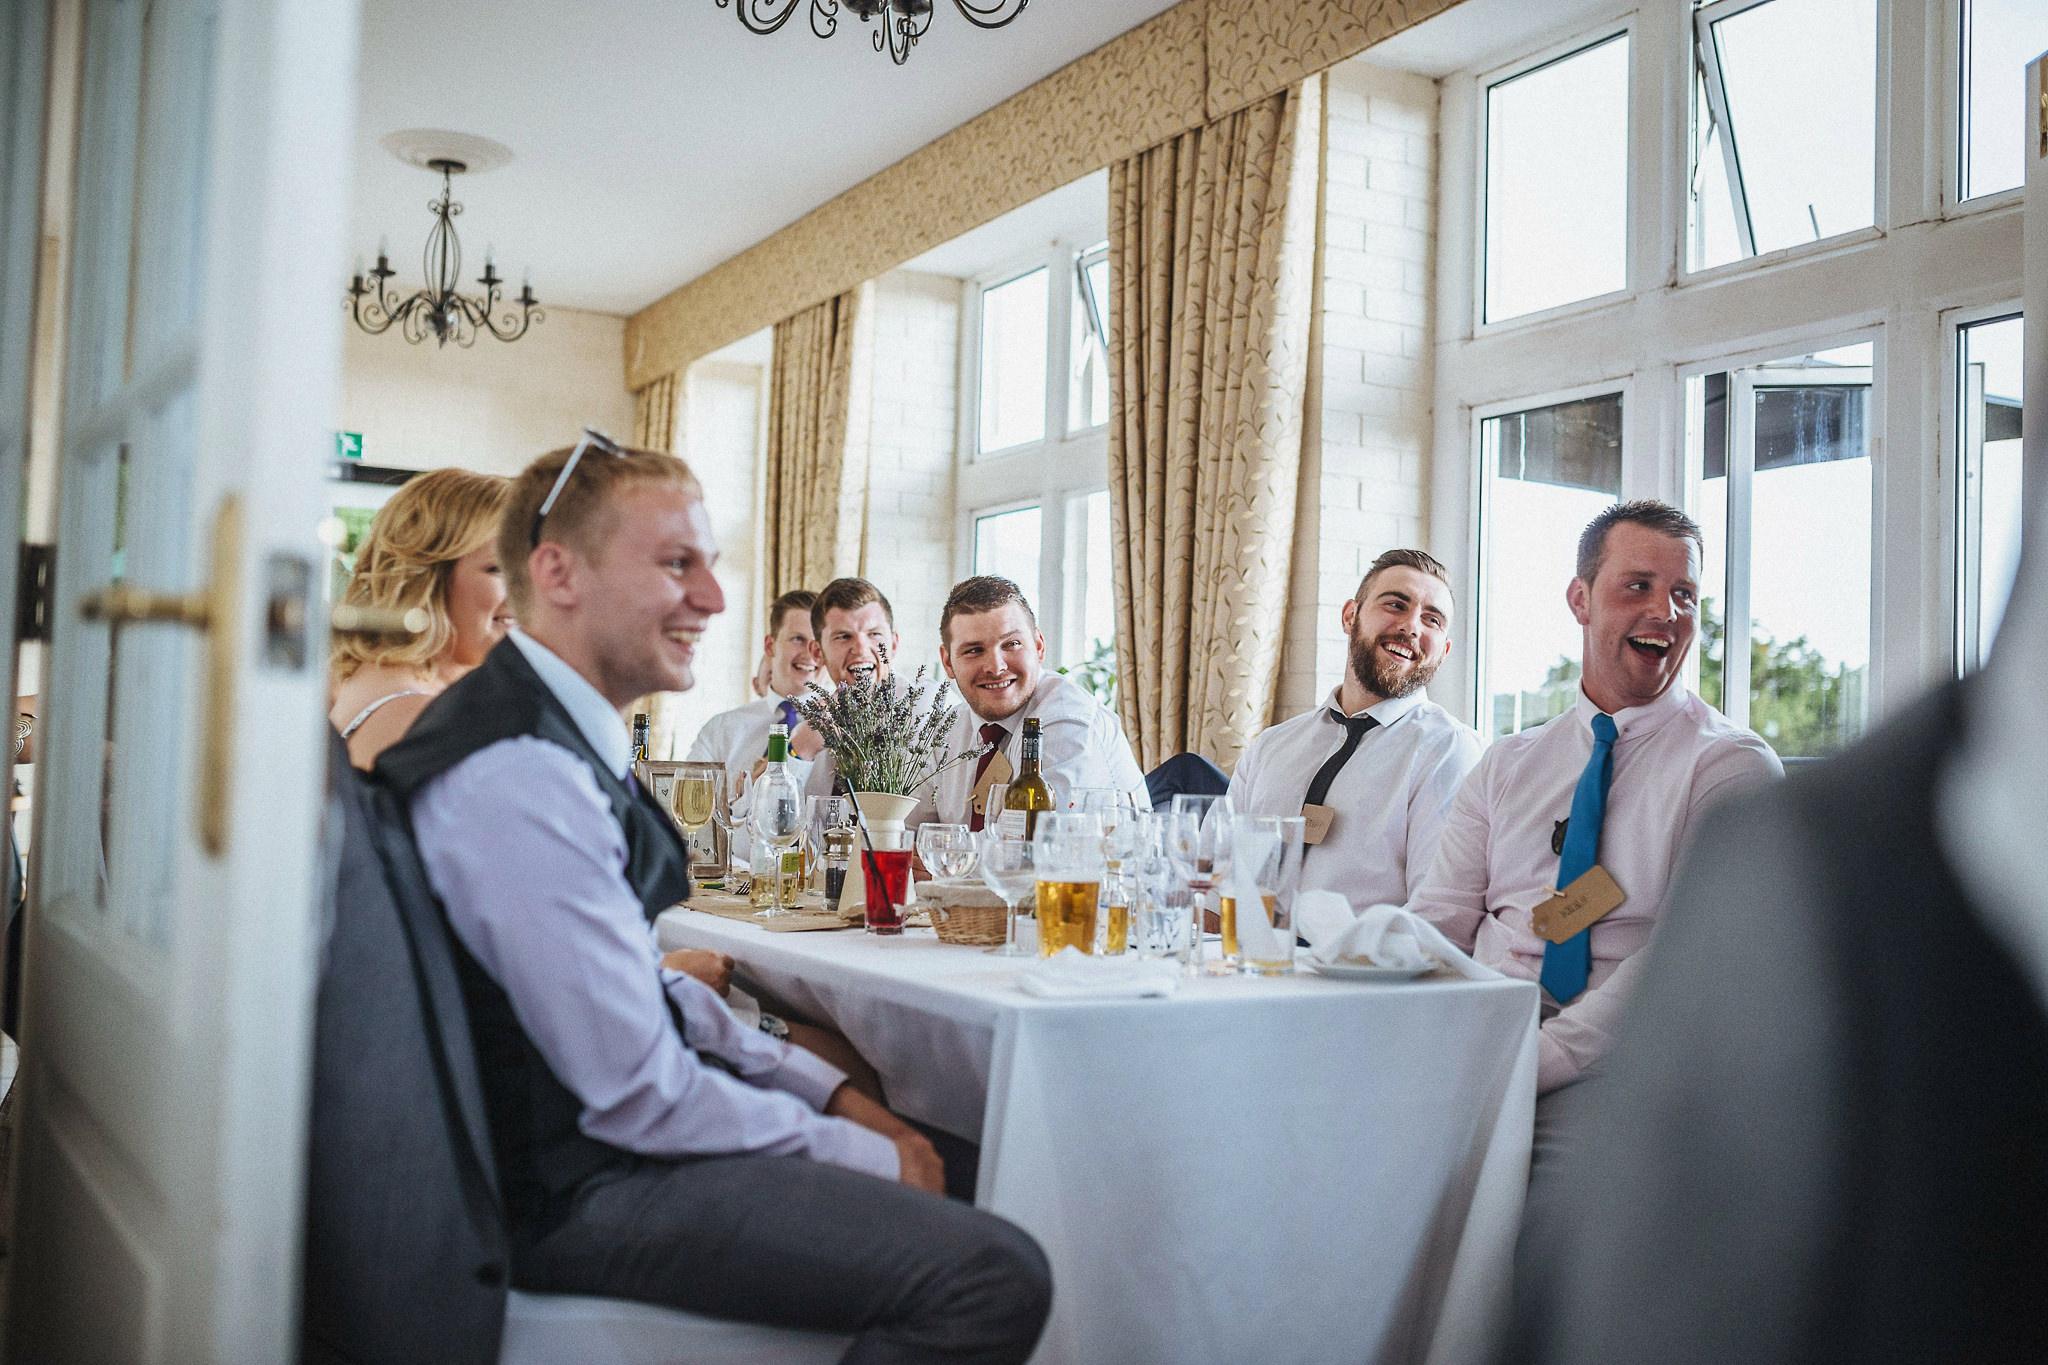 paul-marbrook-Caer-Llan-Wedding-Photographer-90076